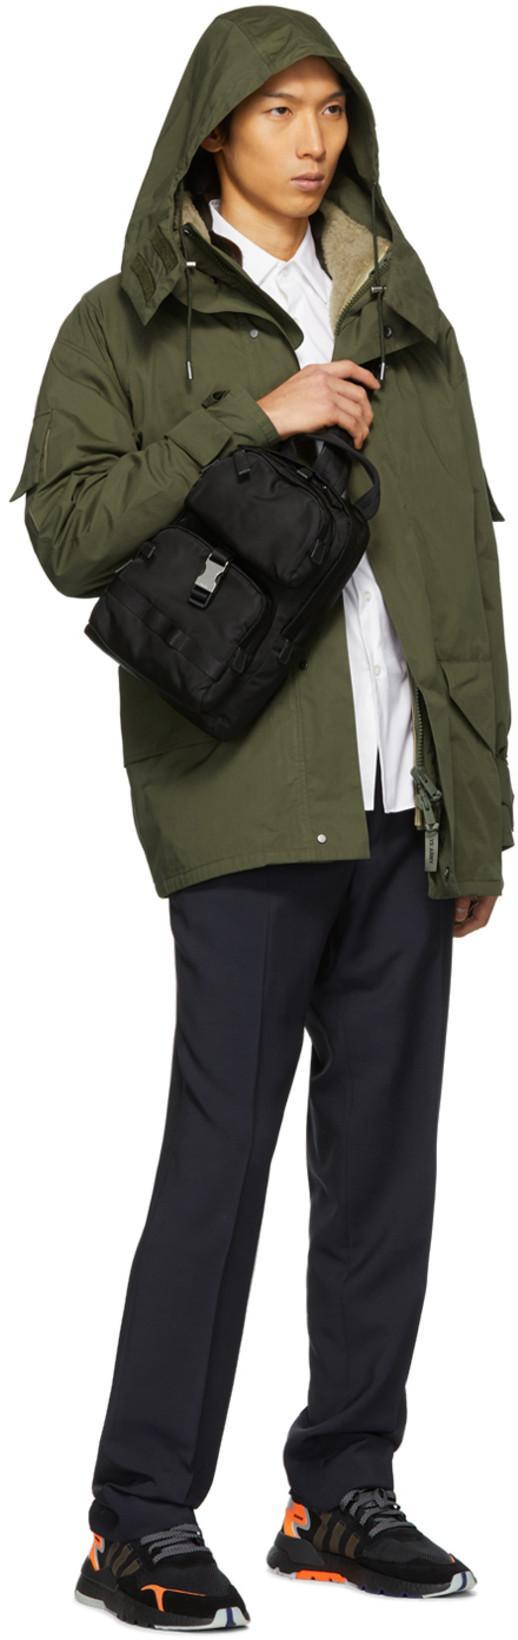 cd2b10f23216 PRADA Prada Black Nylon Mountain Messenger Bag in F0002 Nero